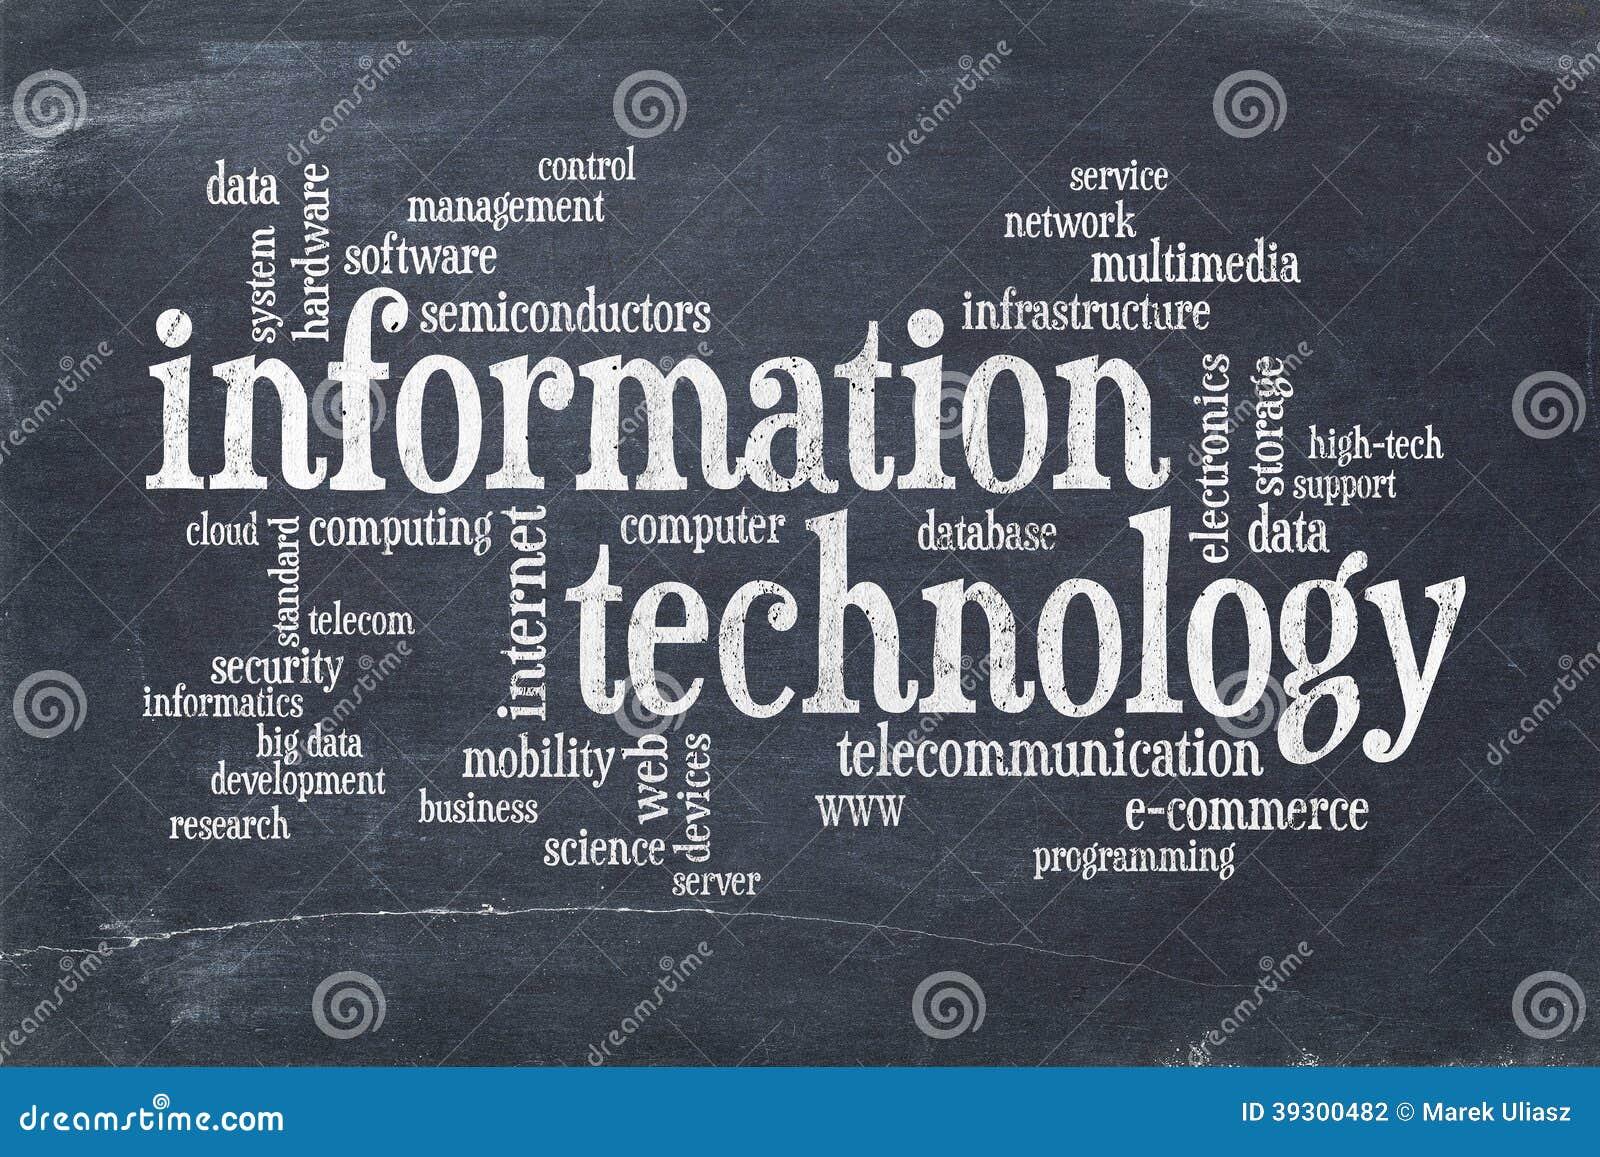 Database internet technologies